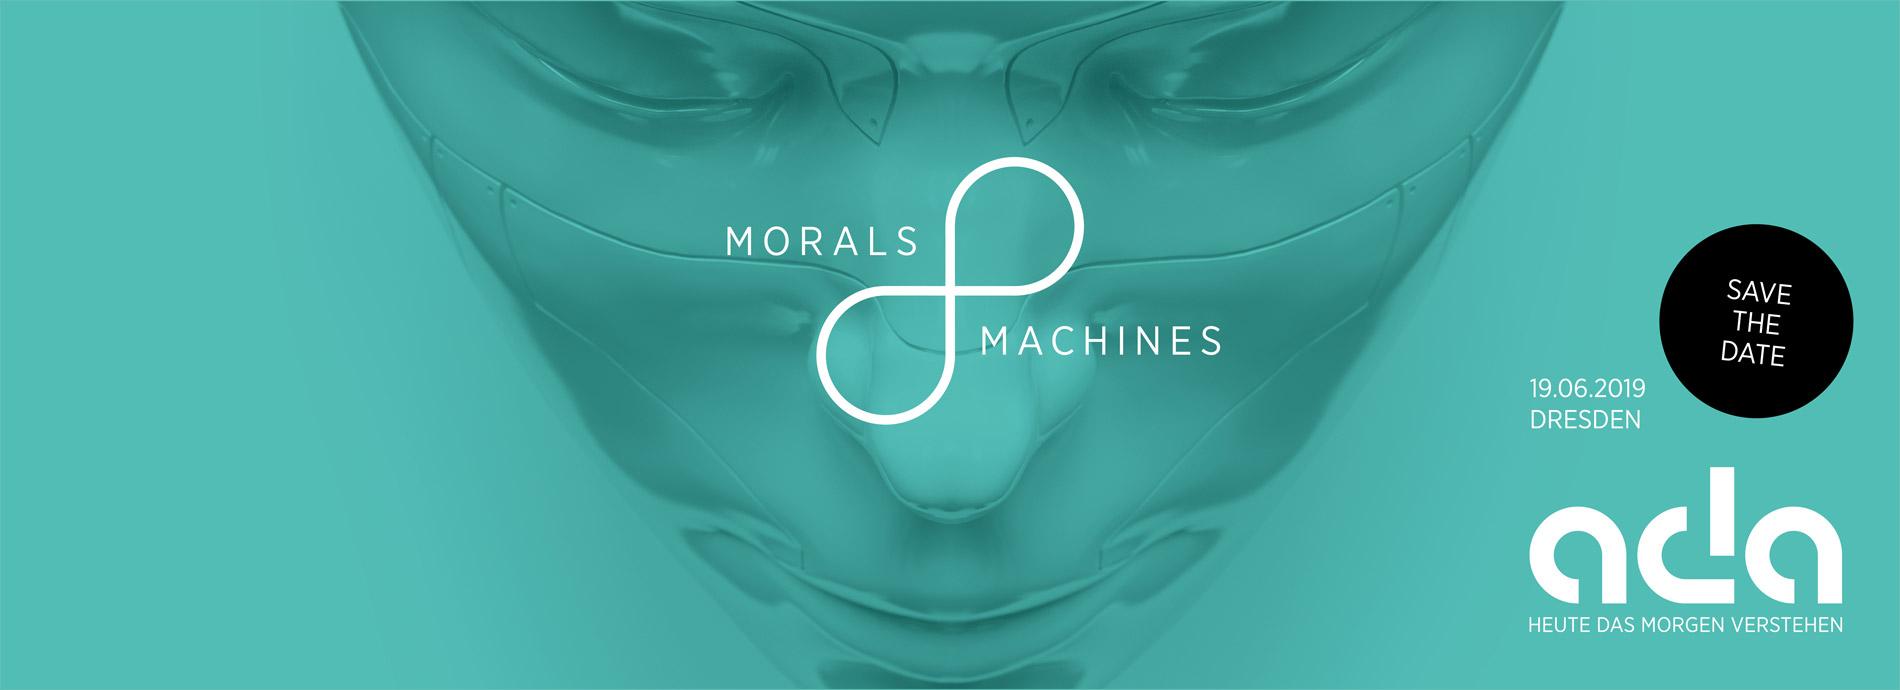 Morals & Machines 2019